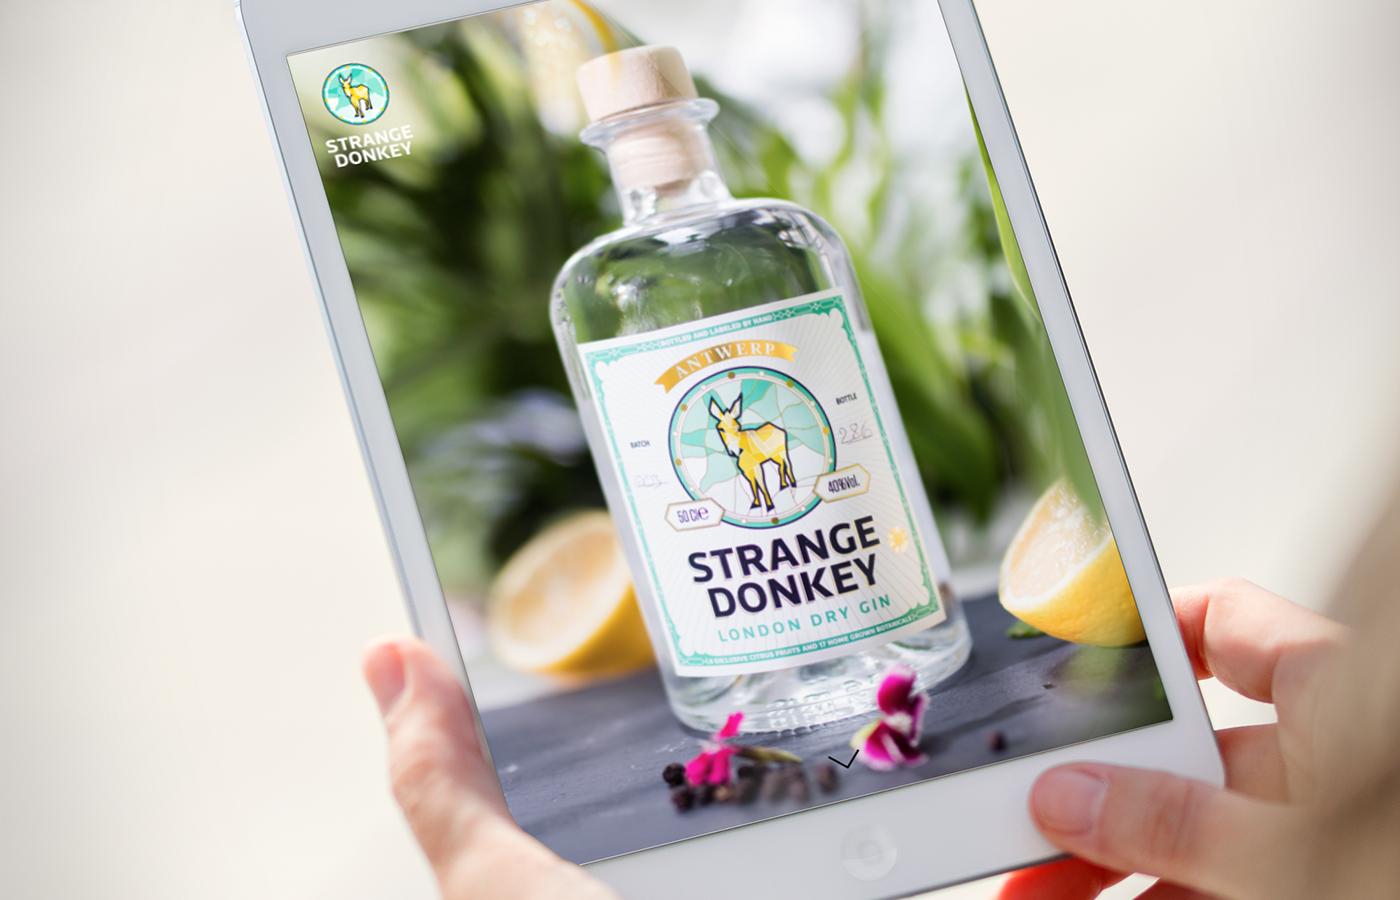 Website of Strange Donkey on tablet